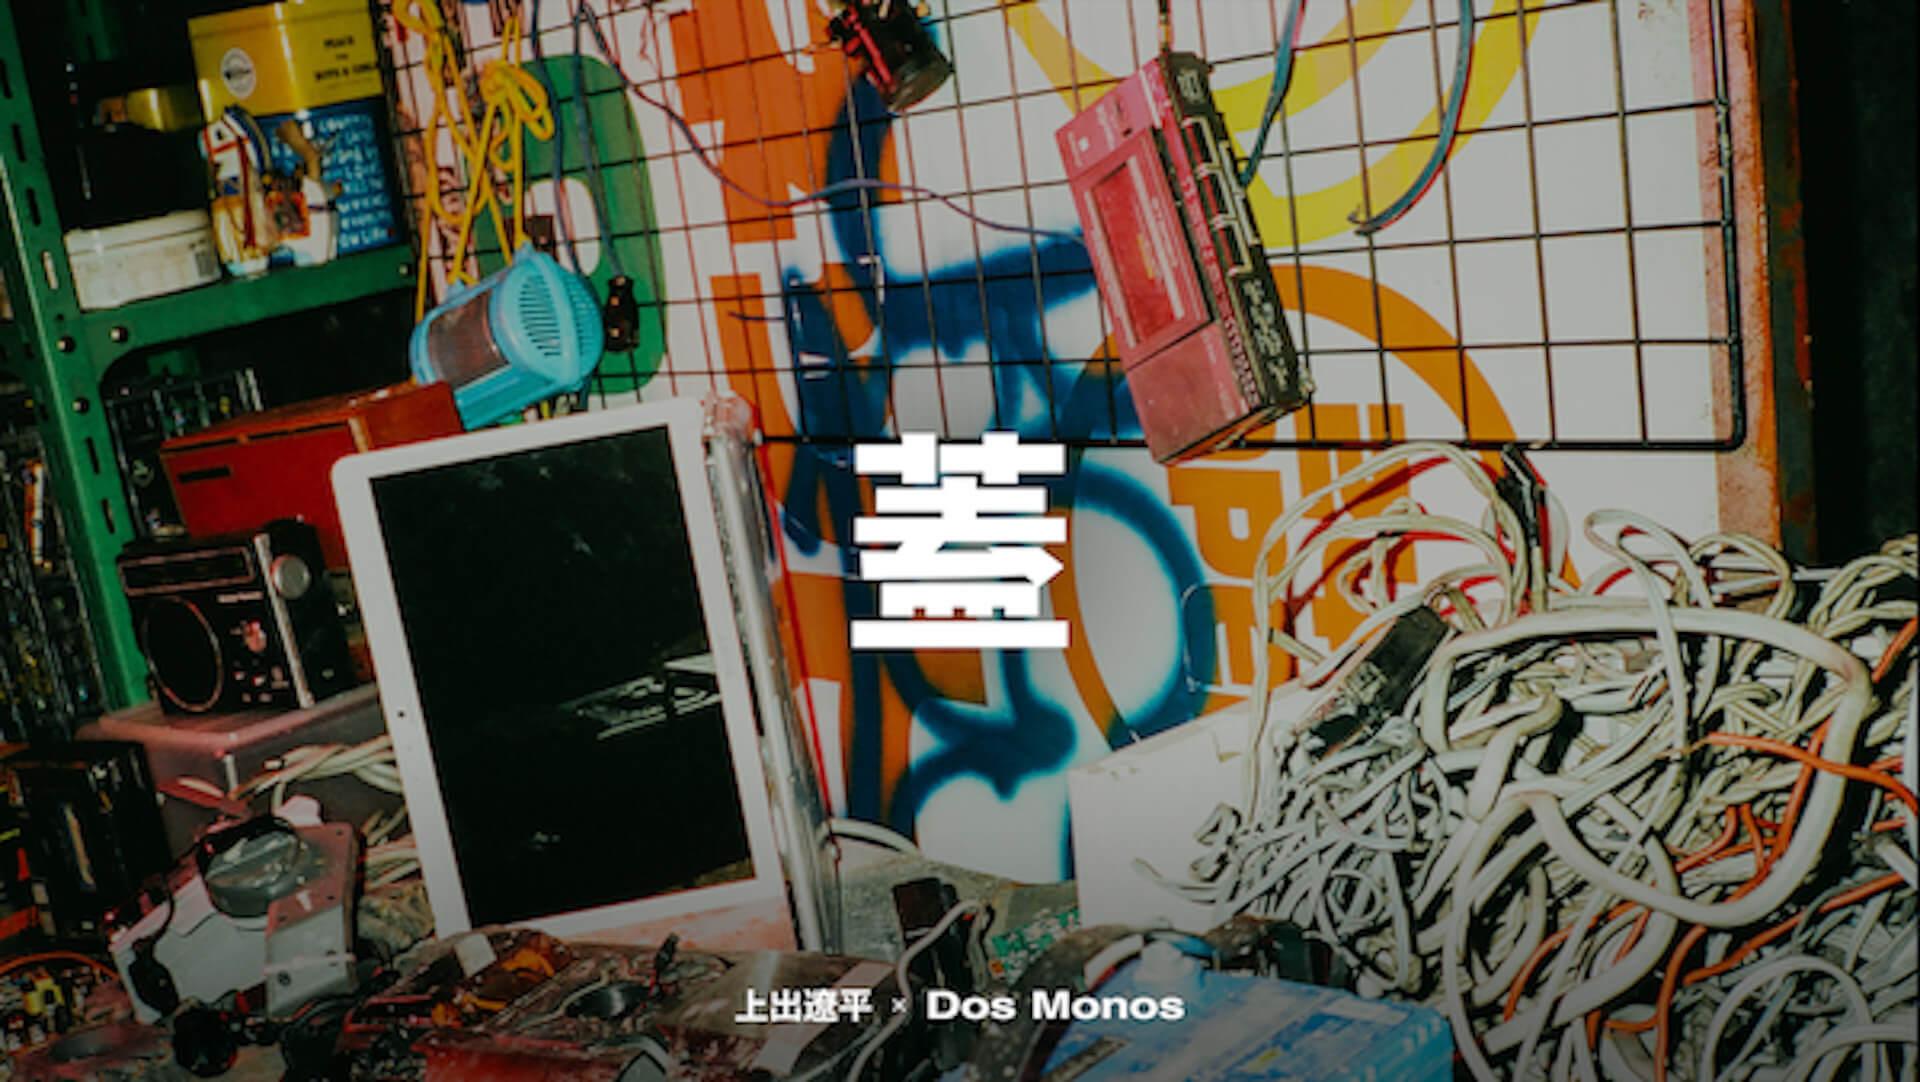 "Dos Monosの新曲""OCCUPIED!""のミュージックビデオが緊急公開!テレビ東京『蓋』でも話題 music210924_dosmonos_mv_1"